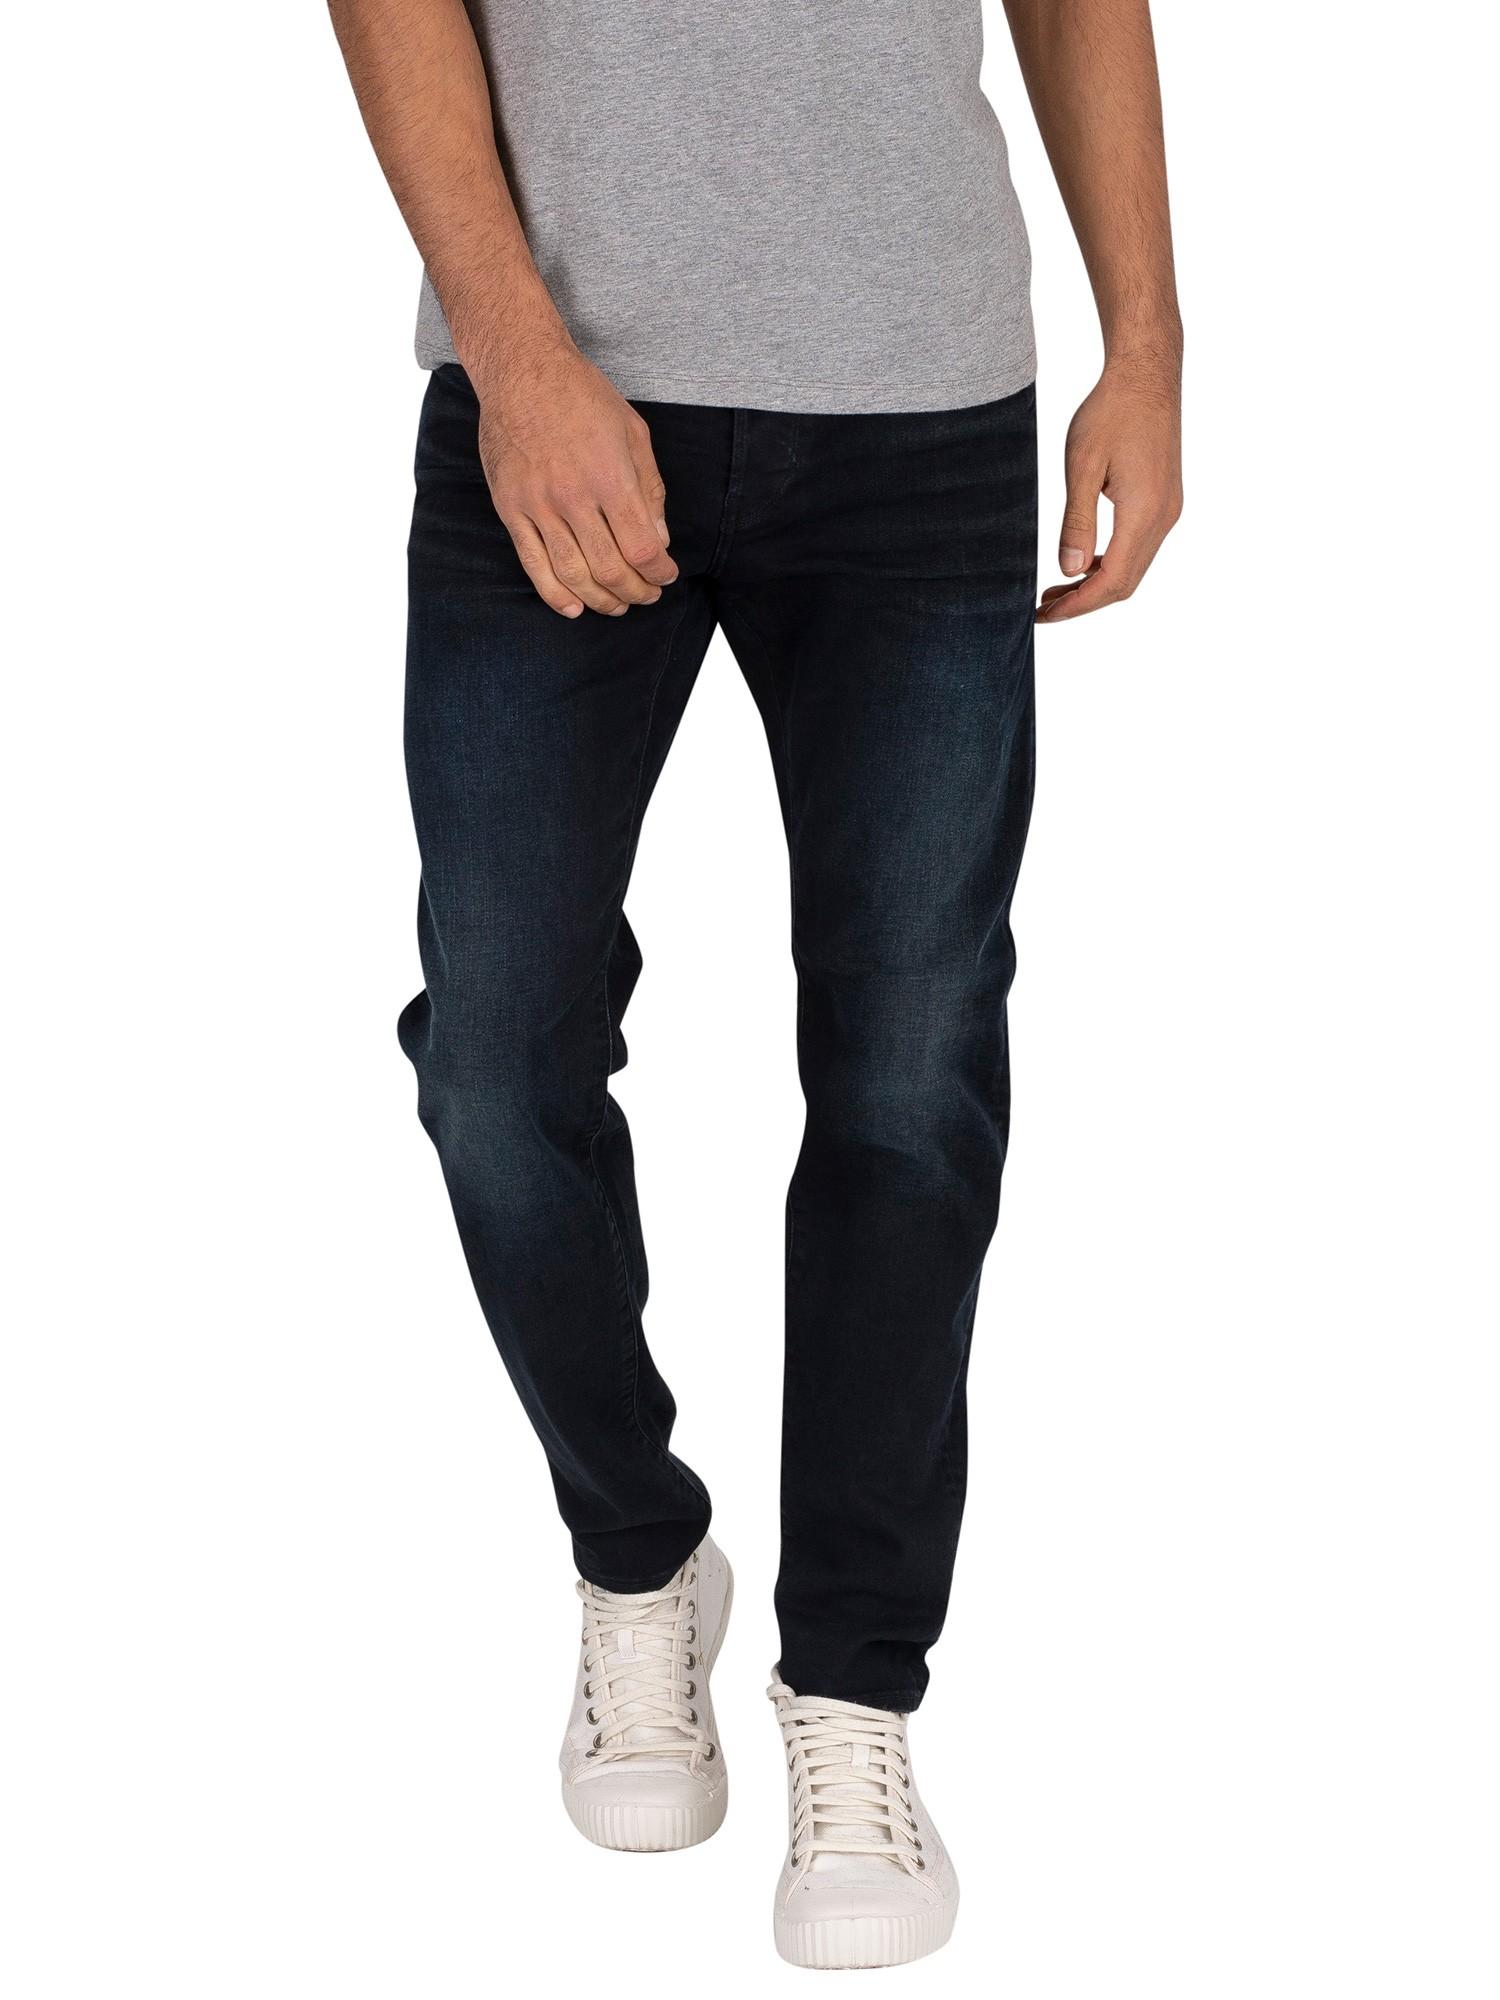 G-Star Raw Mens 3301 Slim Jean